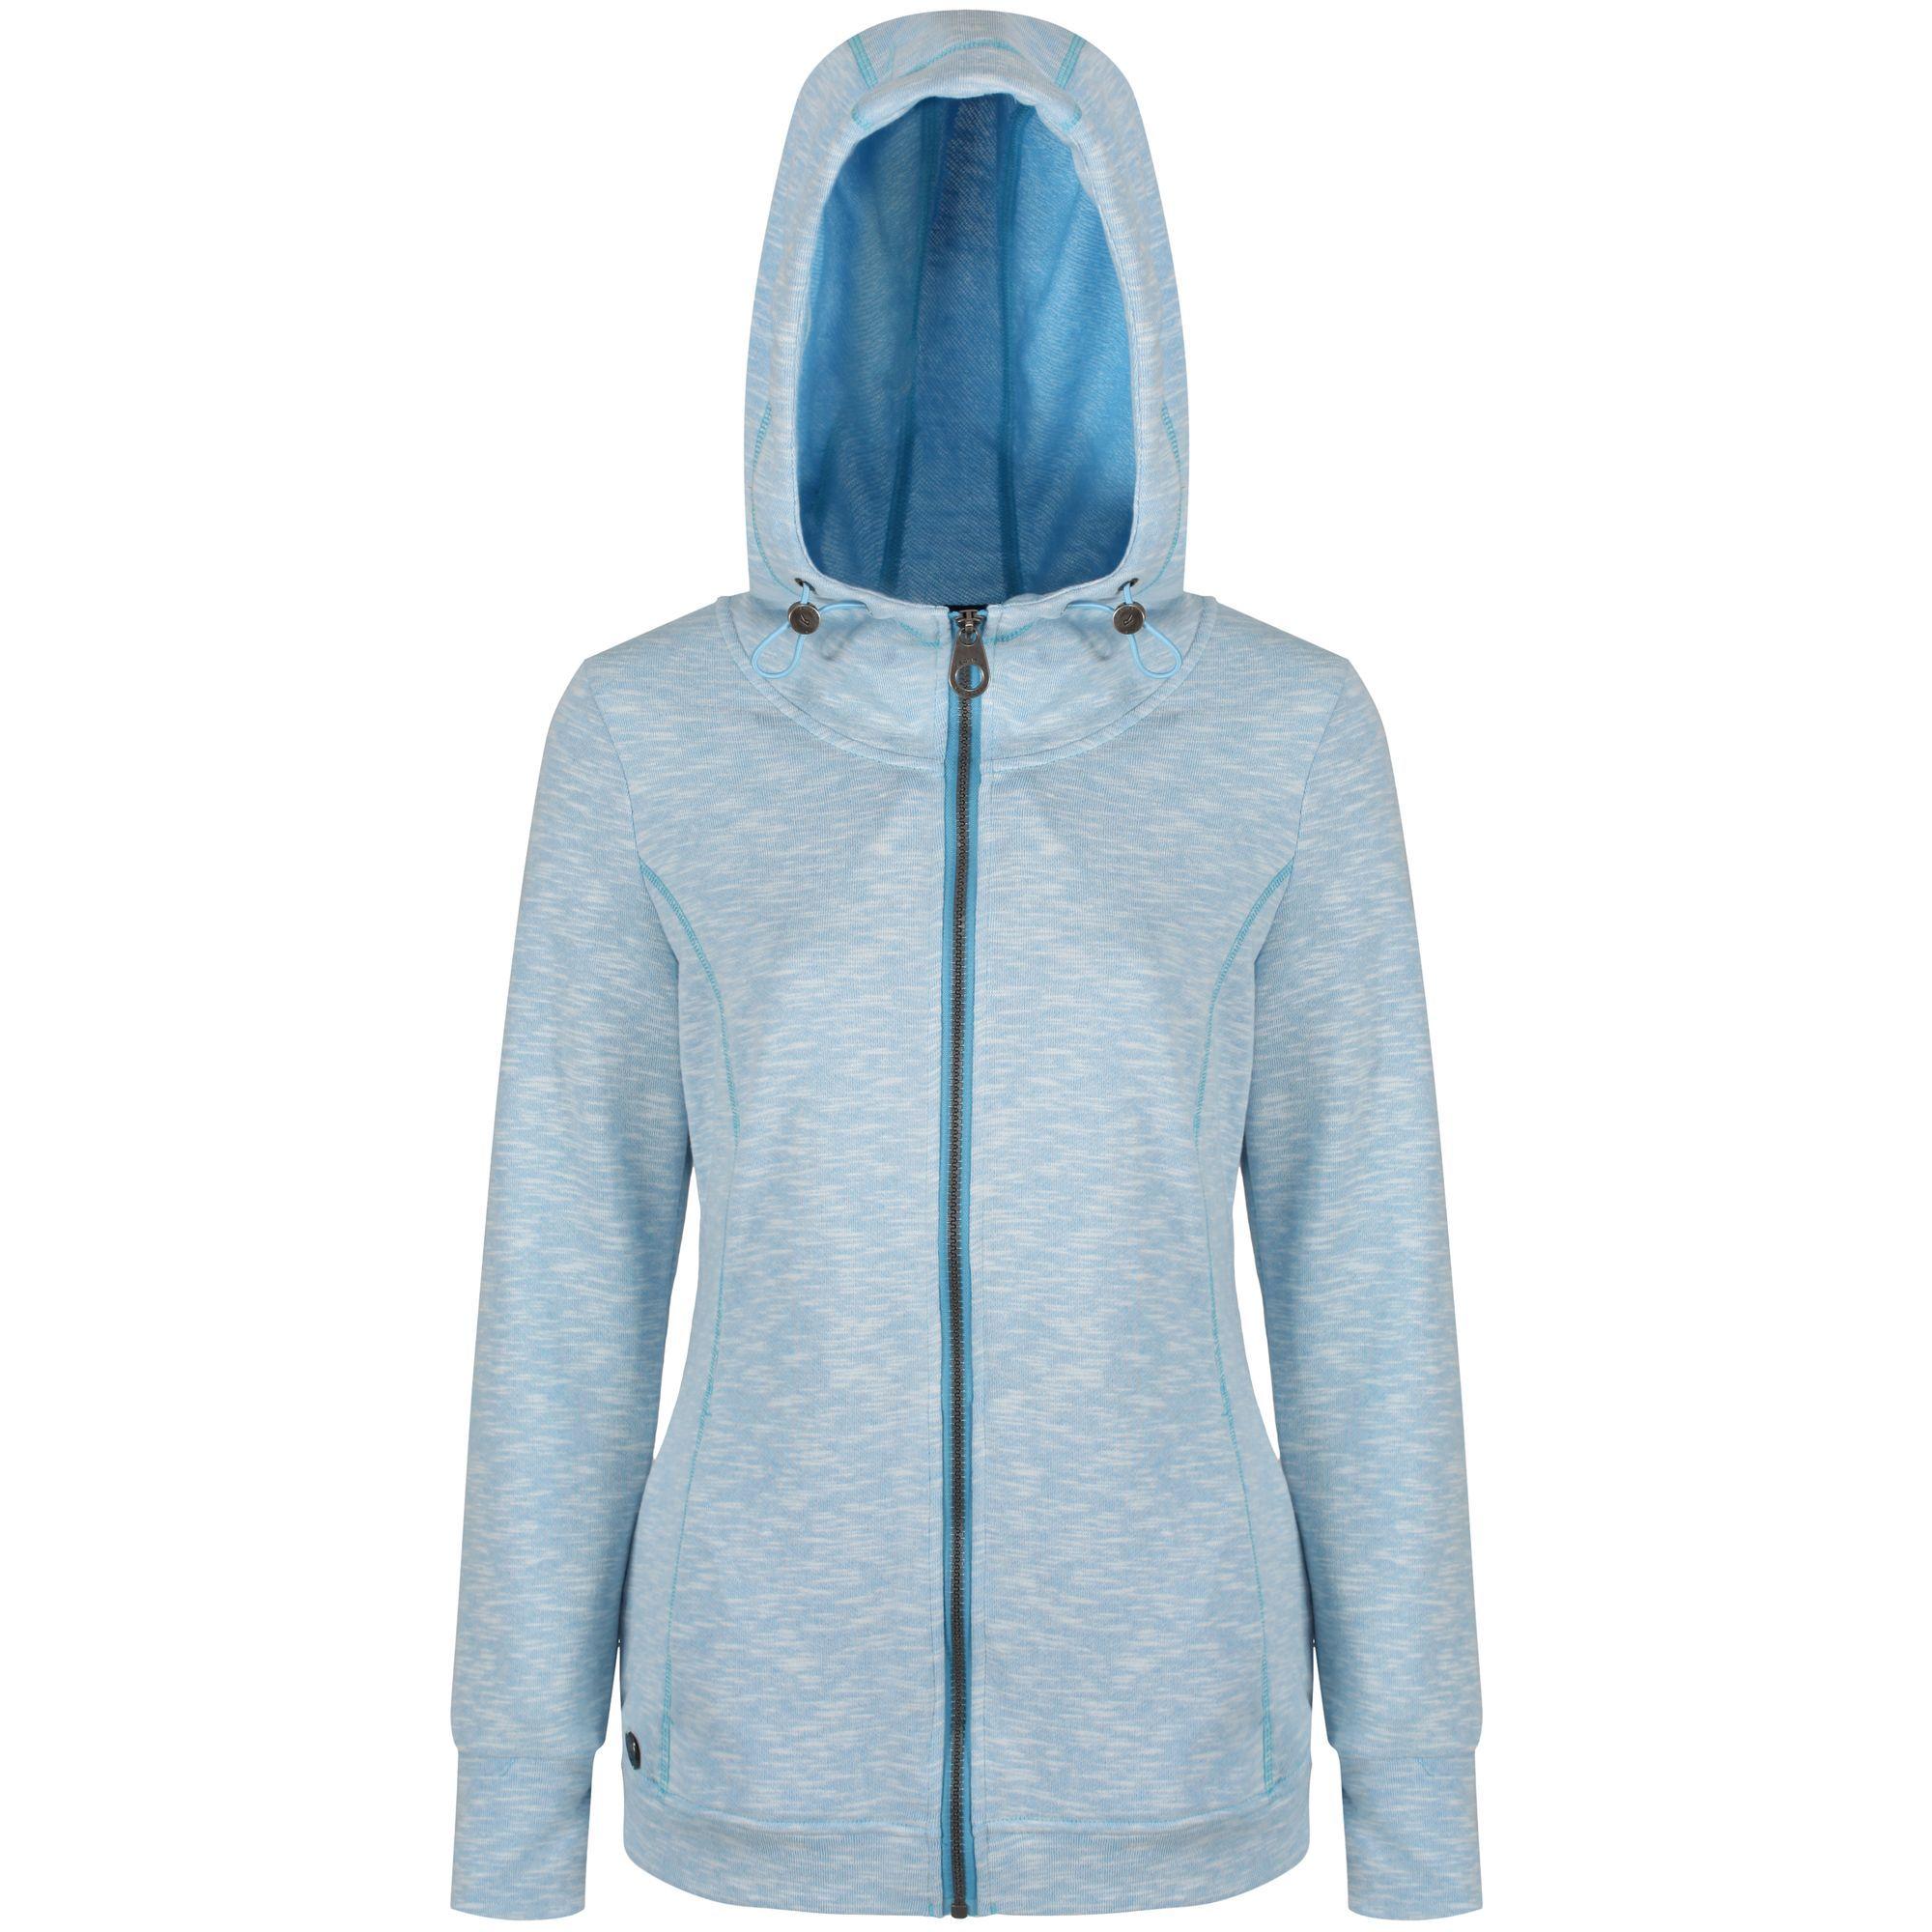 Regatta-Ramosa-Womens-Full-Zip-Hoodie-Hooded-Fleece-Jacket-RRP-50 thumbnail 12